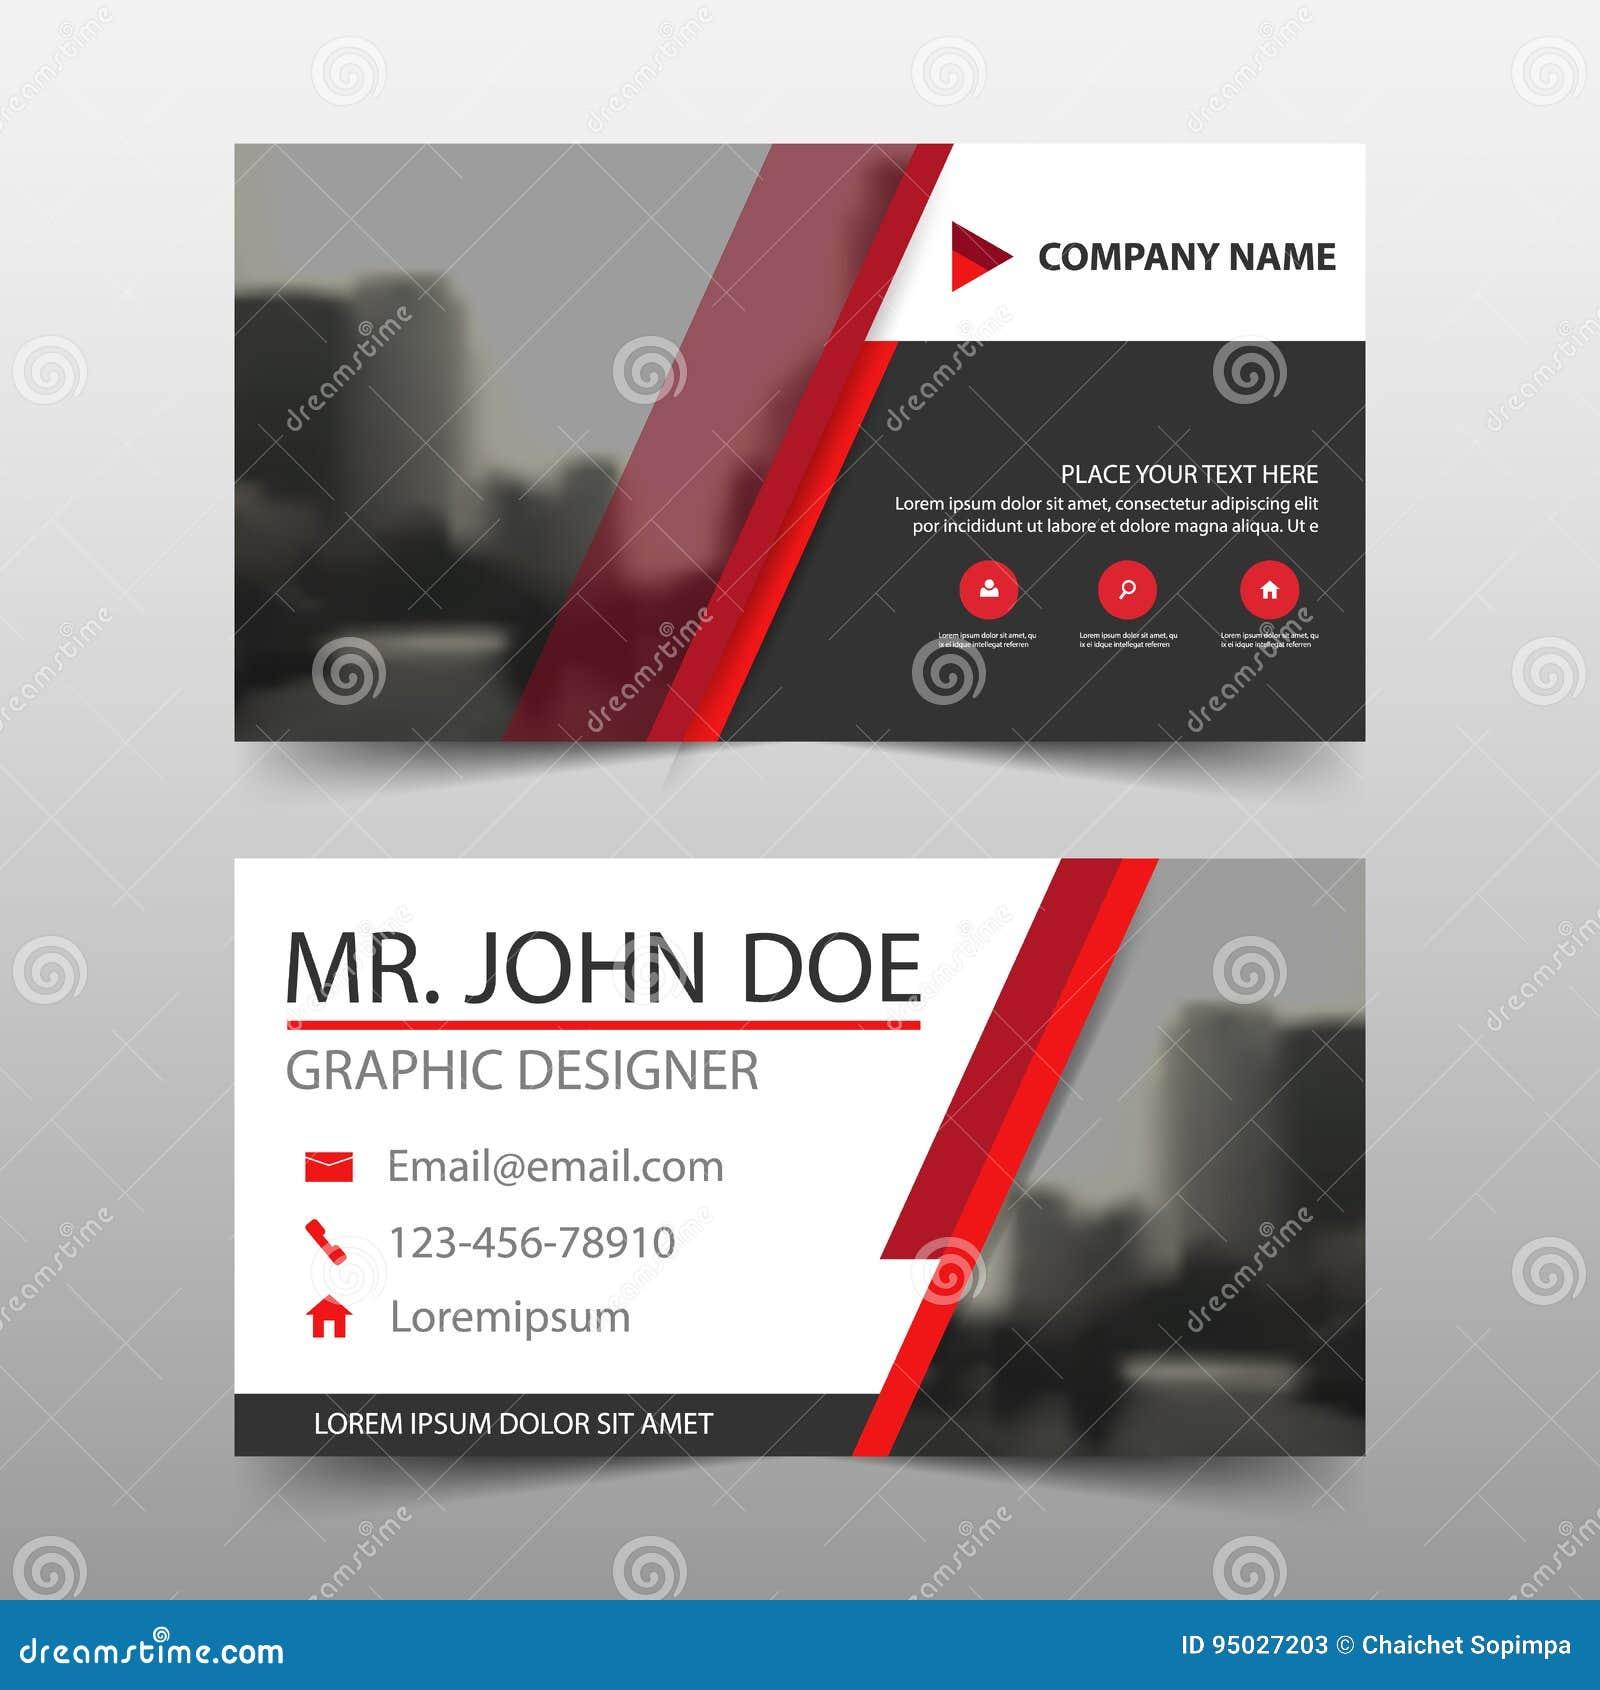 Tarjeta de visita corporativa negra roja, plantilla de la tarjeta de presentación, plantilla limpia simple horizontal del diseño